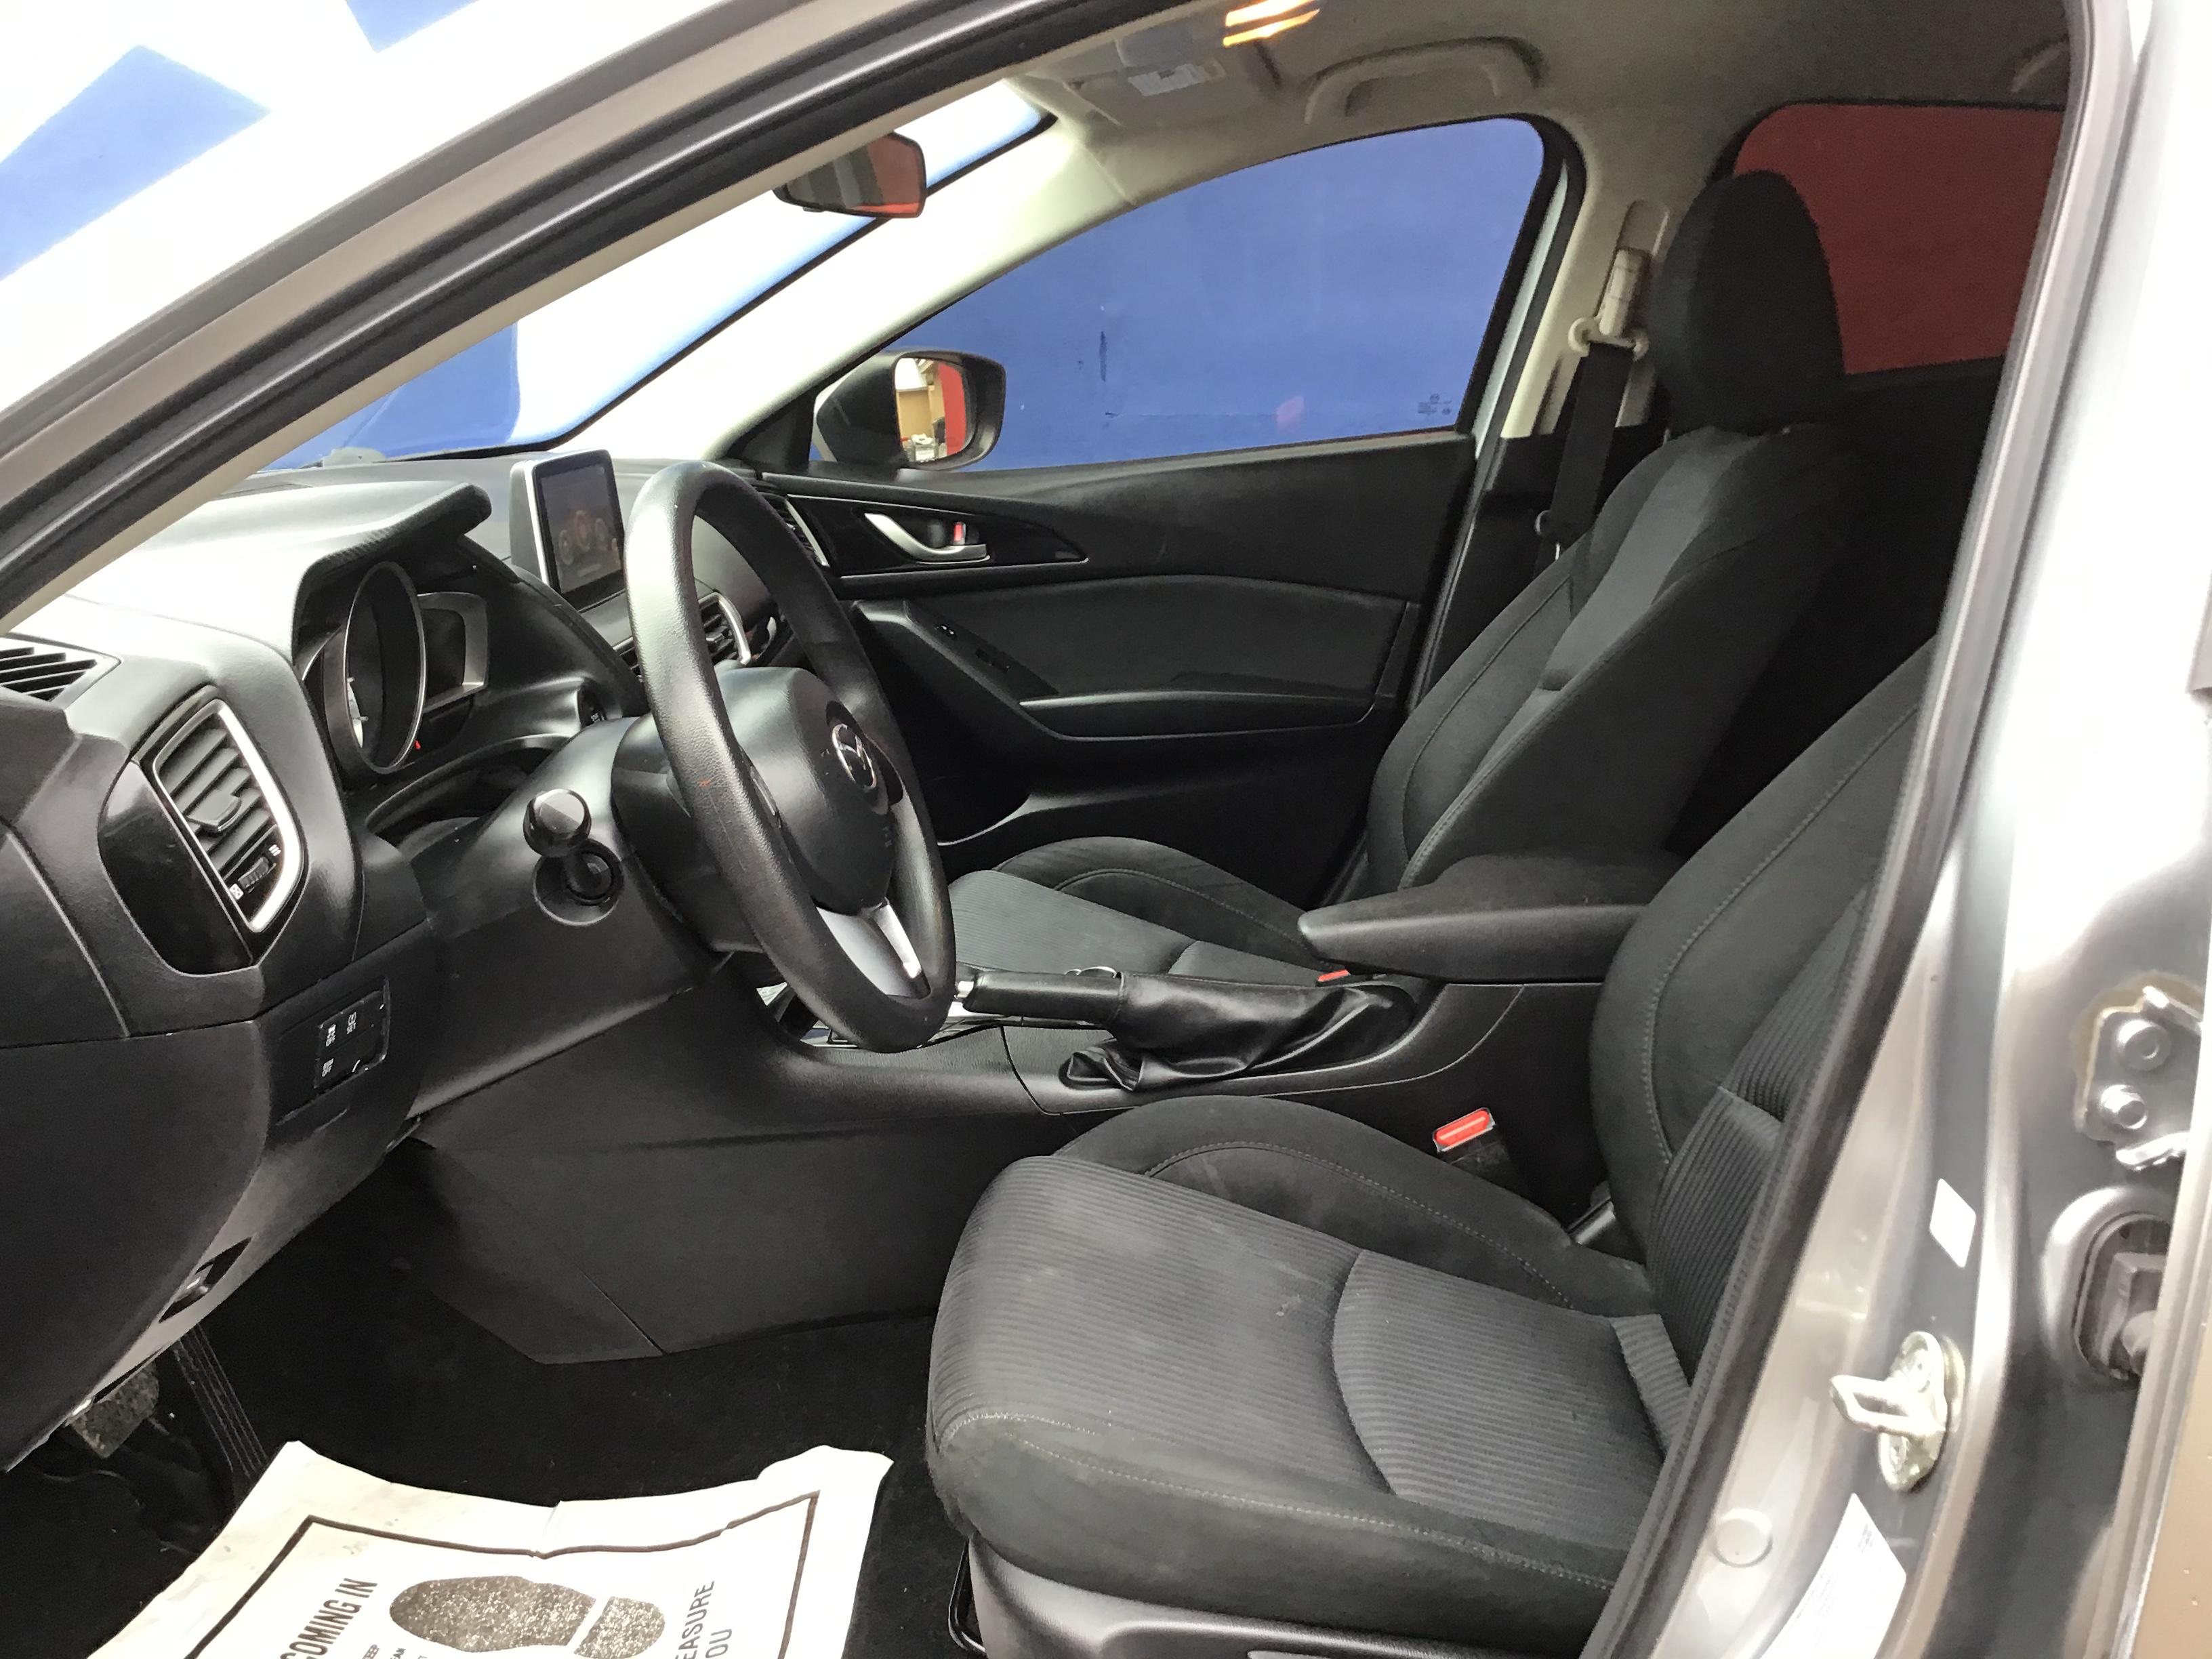 used vehicle - Sedan MAZDA MAZDA3 2016